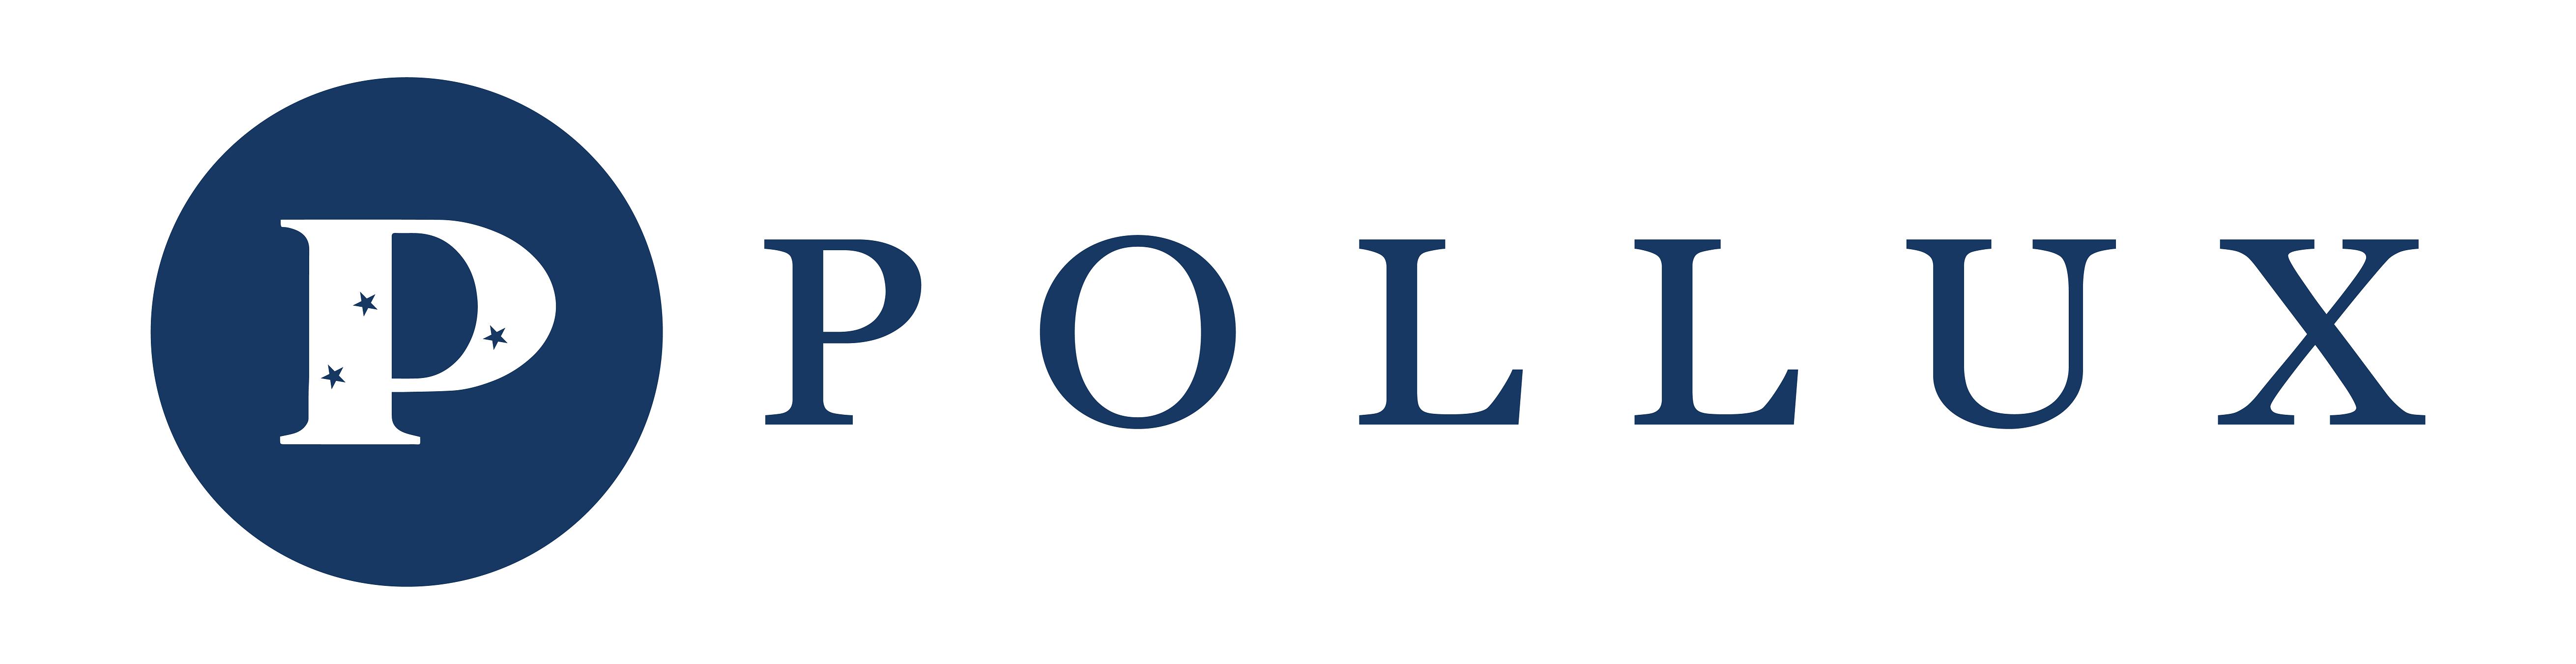 Pollux-01